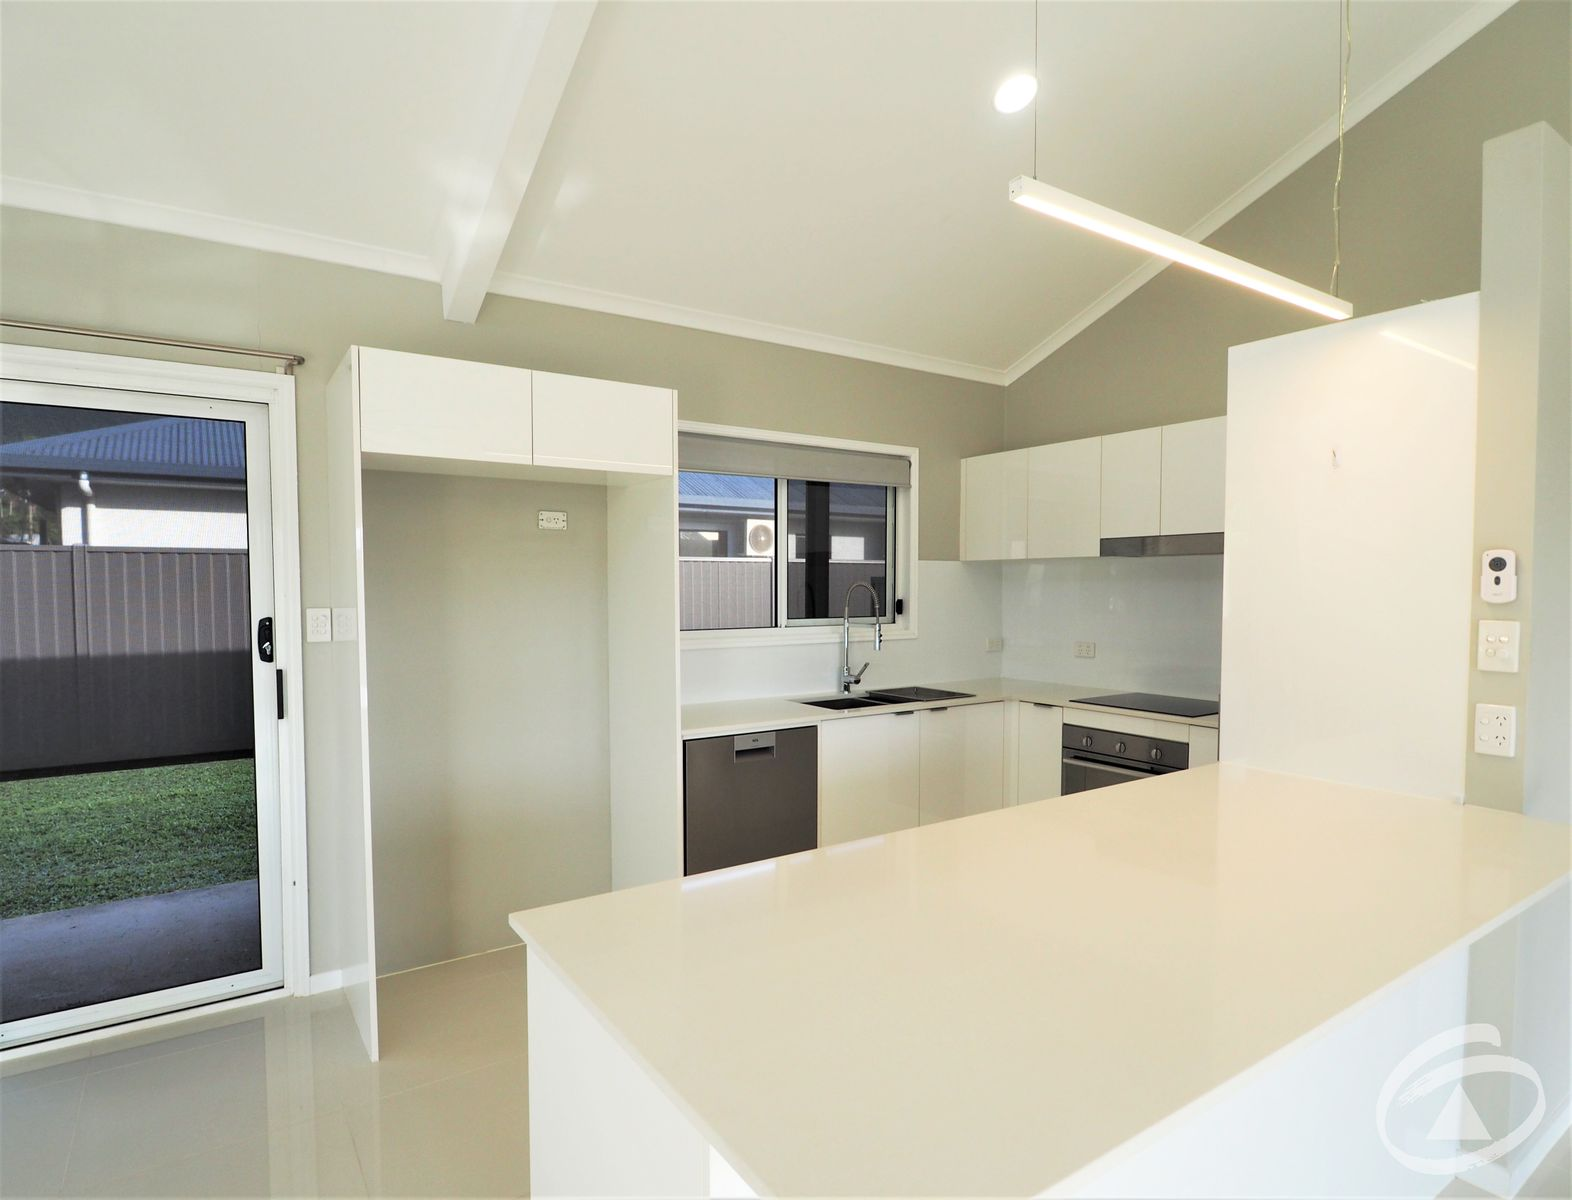 1 Kirsten Close, Woree, QLD 4868